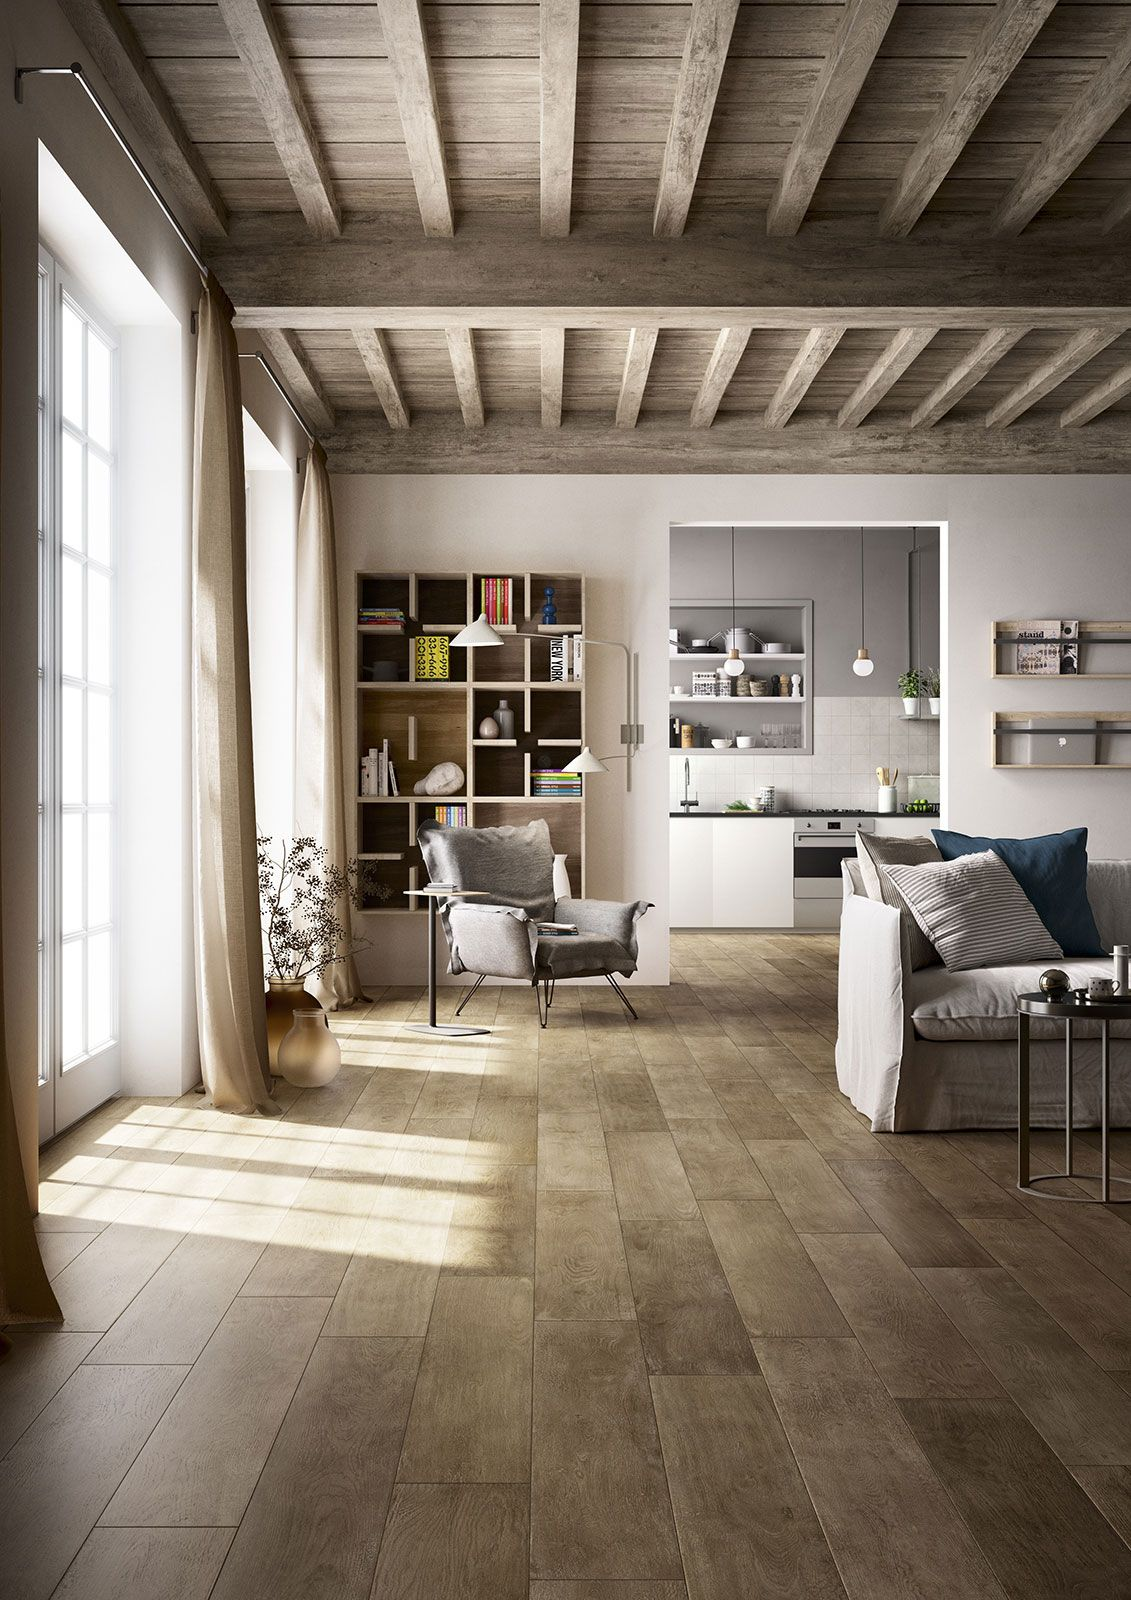 Treverktime Ceramic Tiles Marazzi 6538 Progettazione